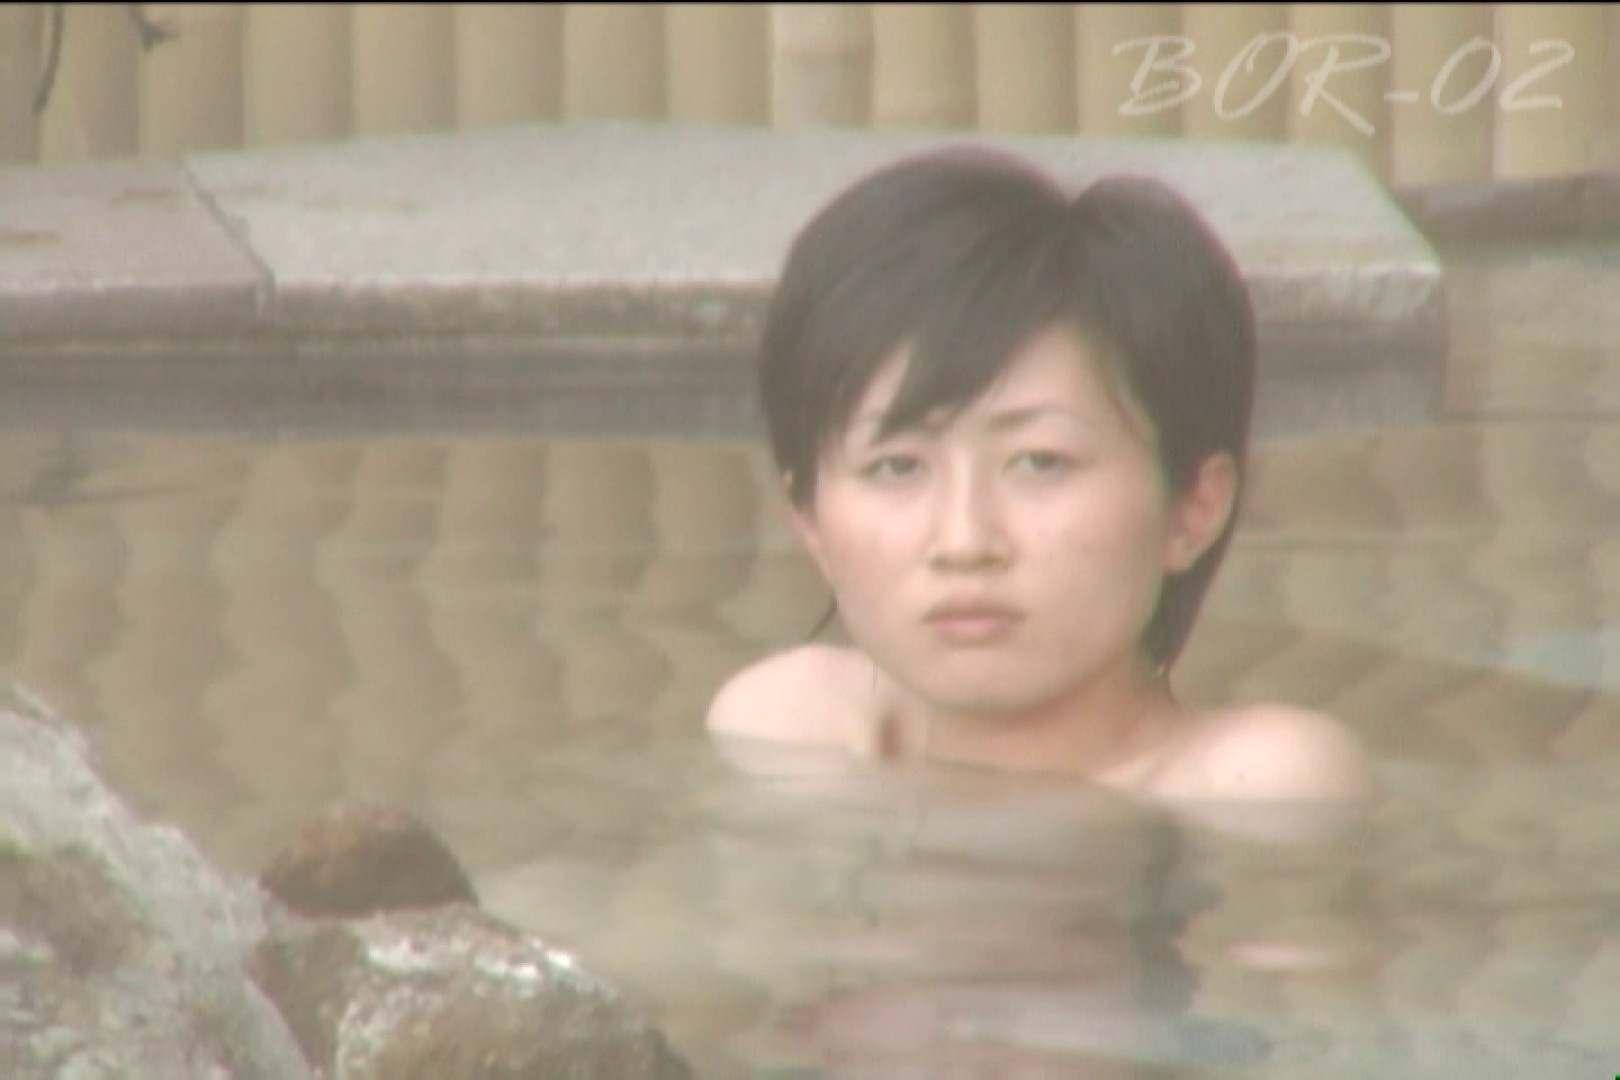 Aquaな露天風呂Vol.480 0  44連発 16